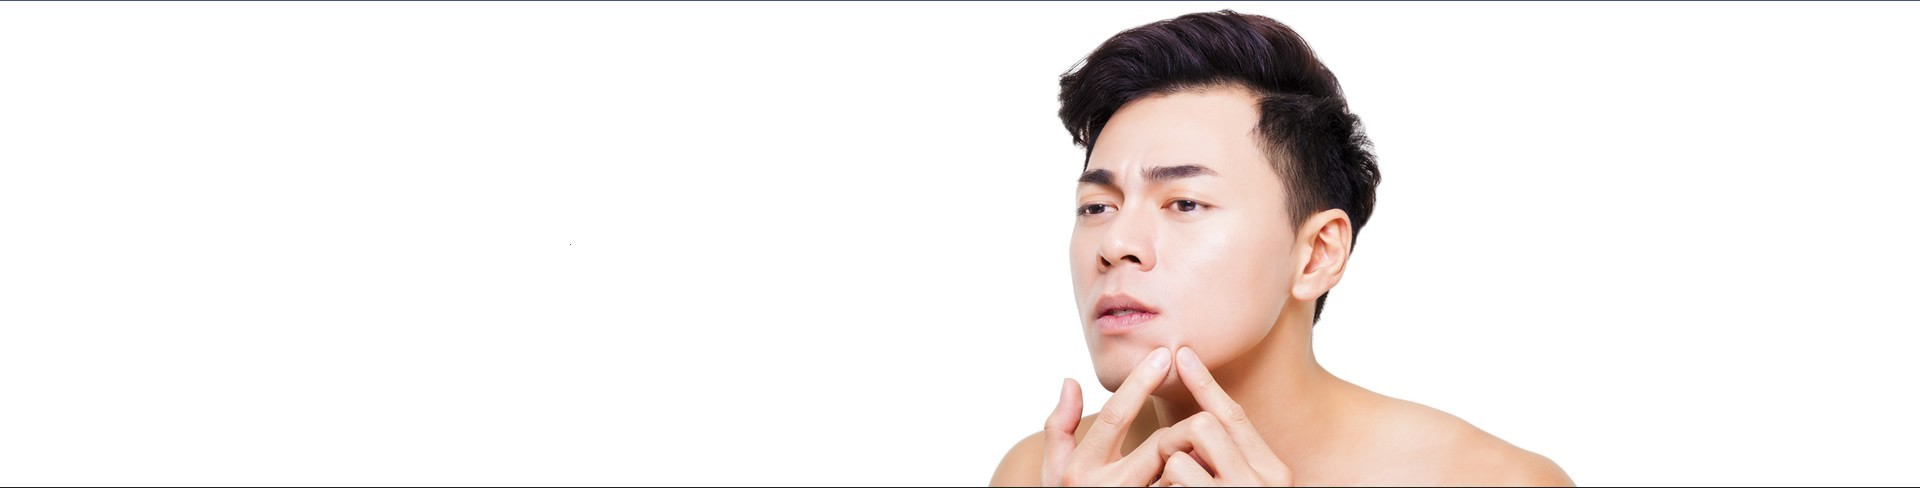 Acne Scar Treatment - Smooth Skin Health Centre Hamilton